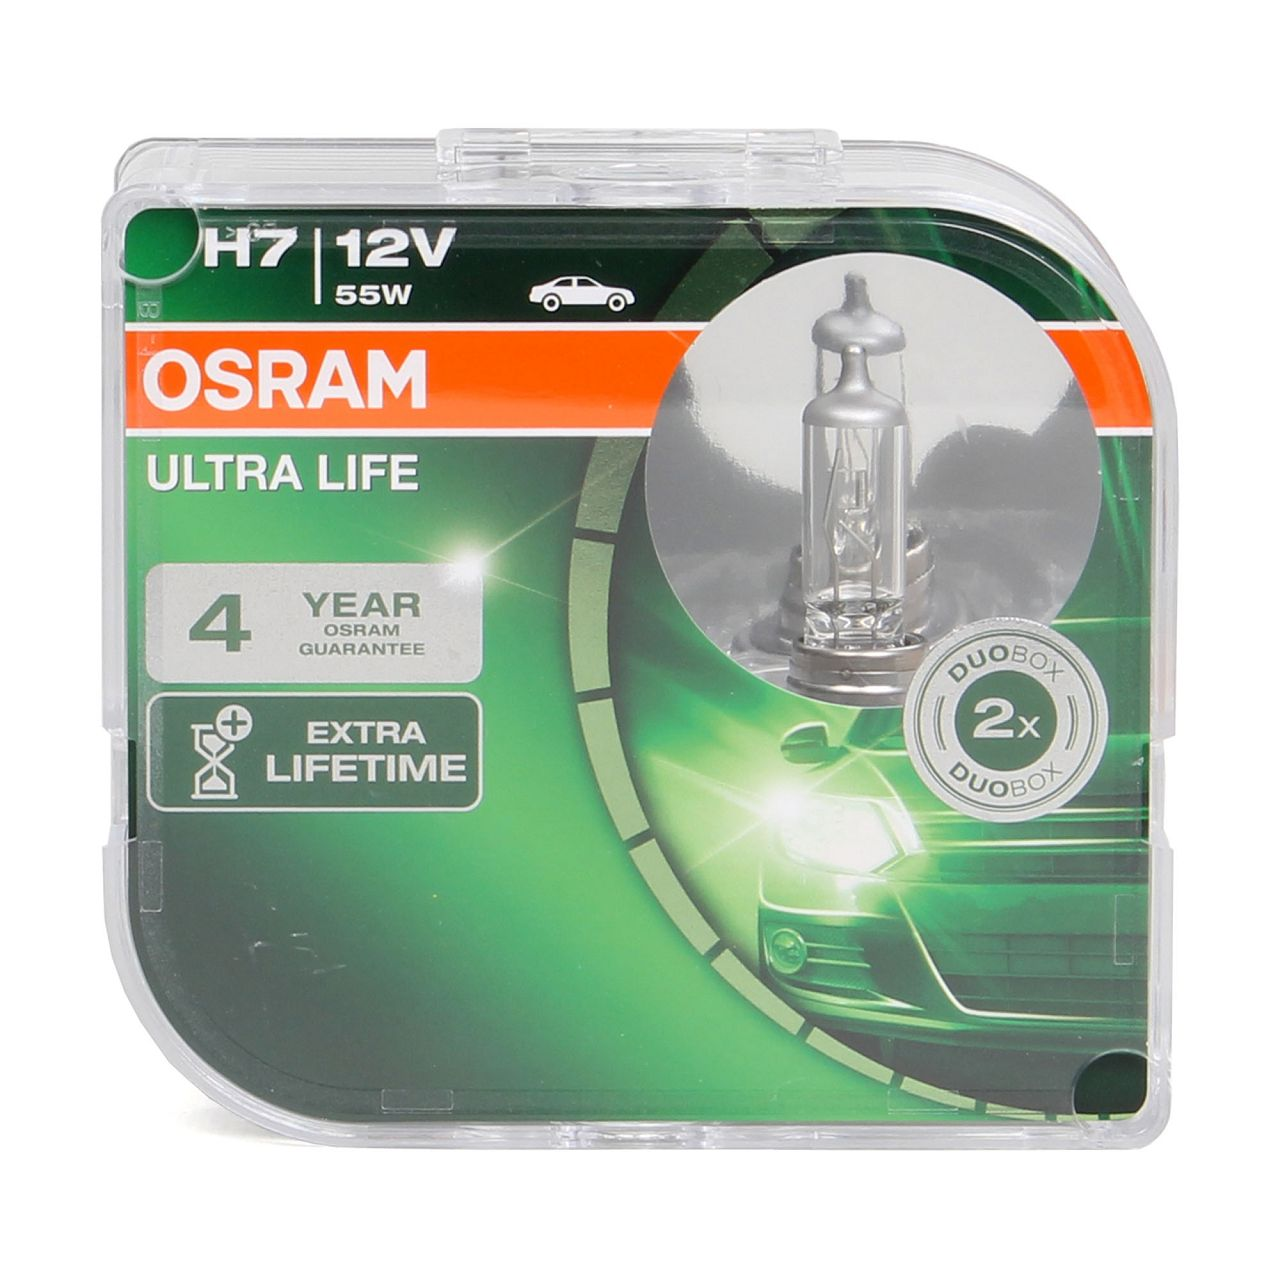 2x OSRAM Halogenlampe H7 ULTRA LIFE 12V 55W PX26d 64210ULT-HCB